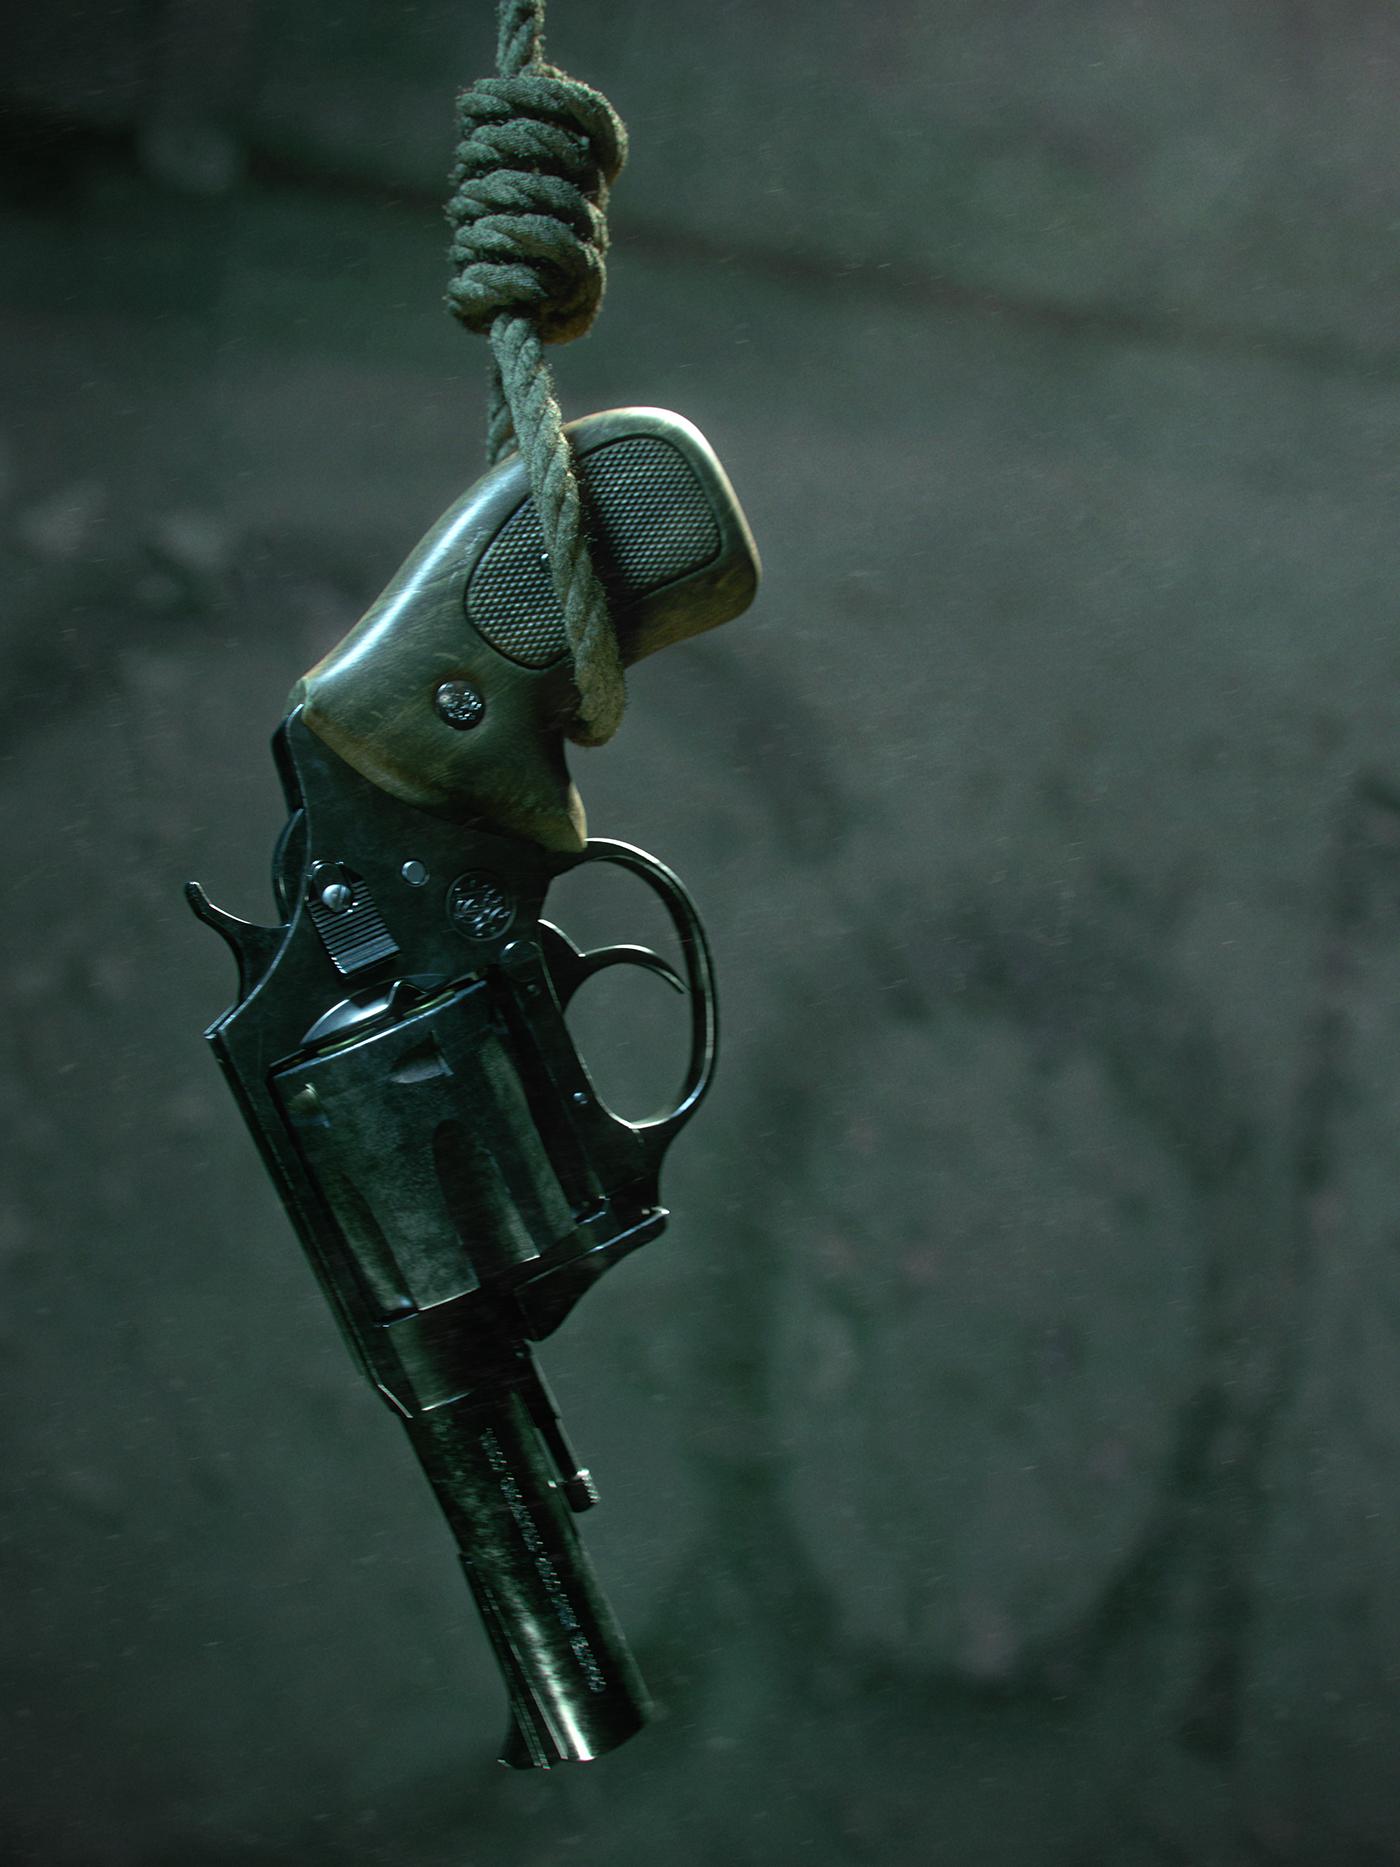 dark death suicide Gun cinematography 3D Render sad bulldog 44